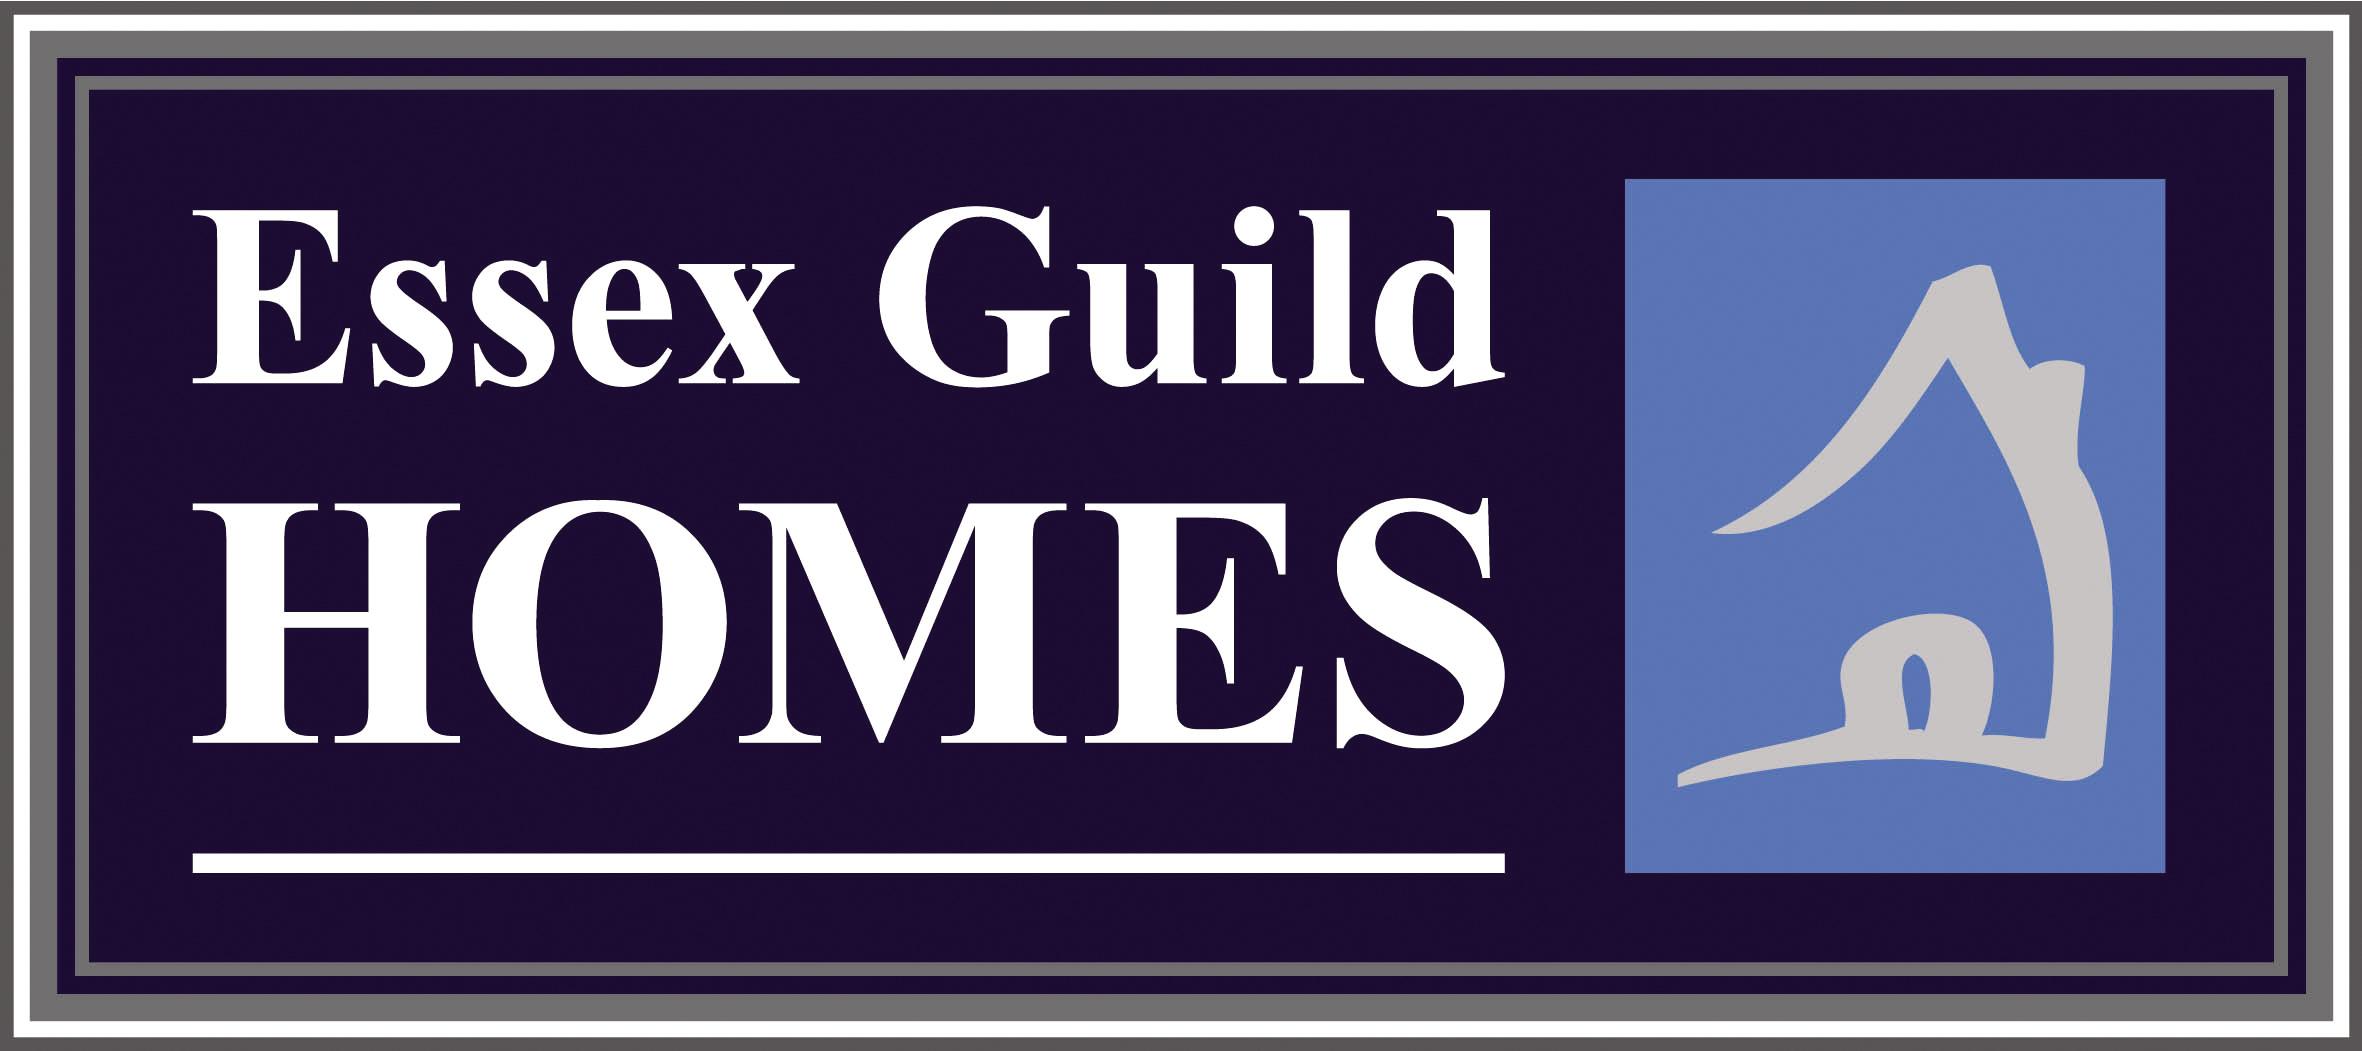 Essex Guild Homes